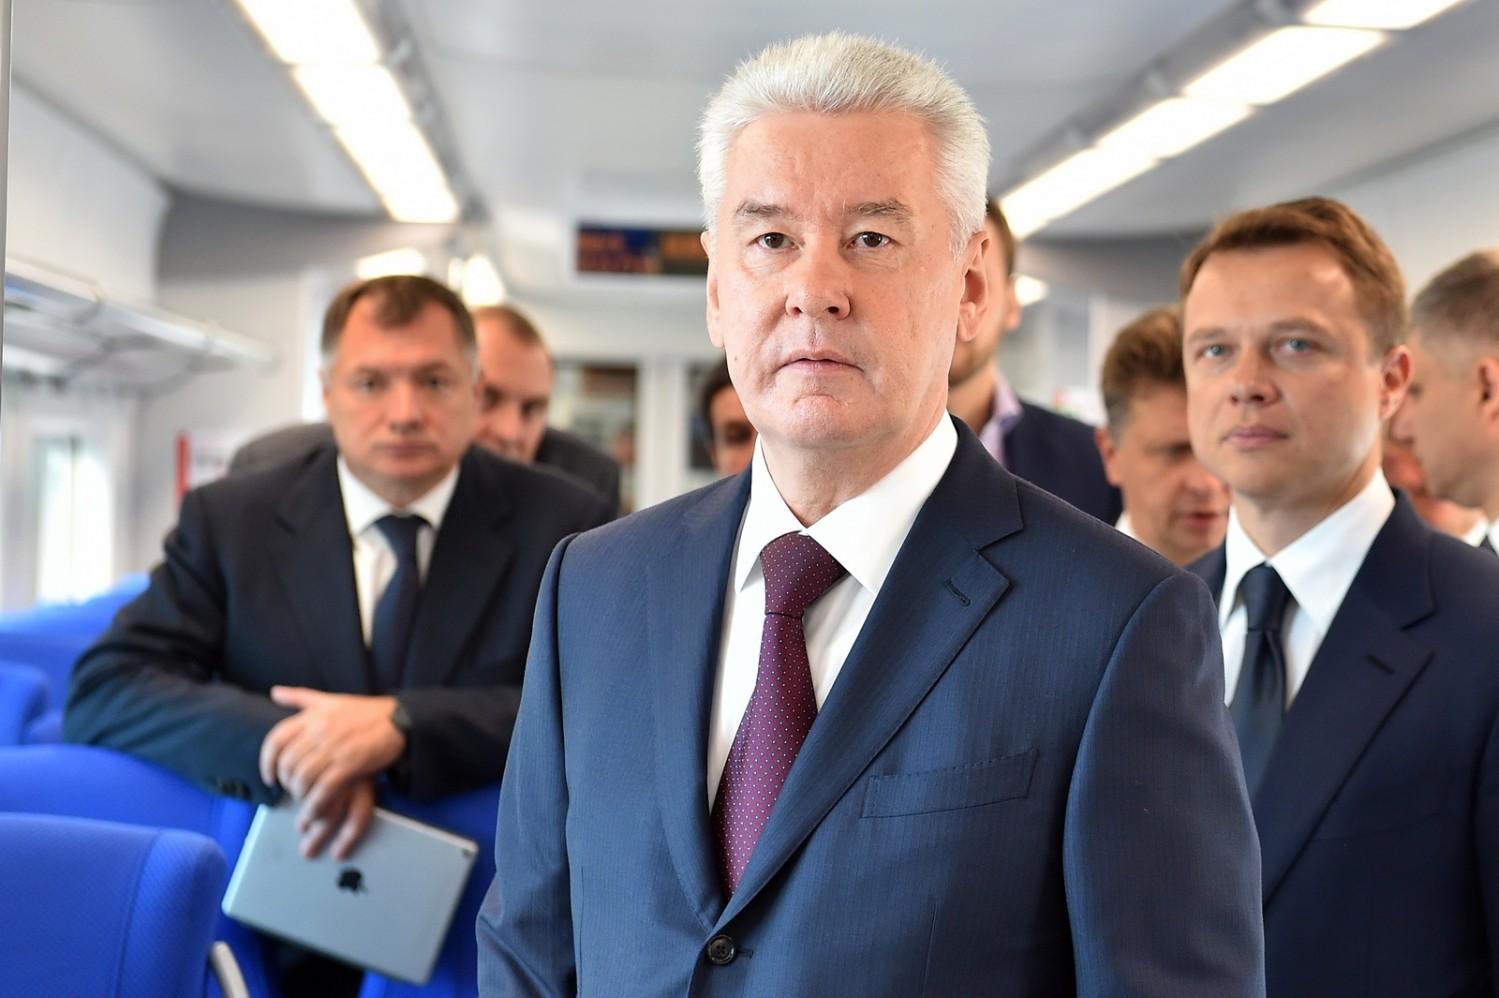 Сергей Собянин. Фото: stroi.mos.ru